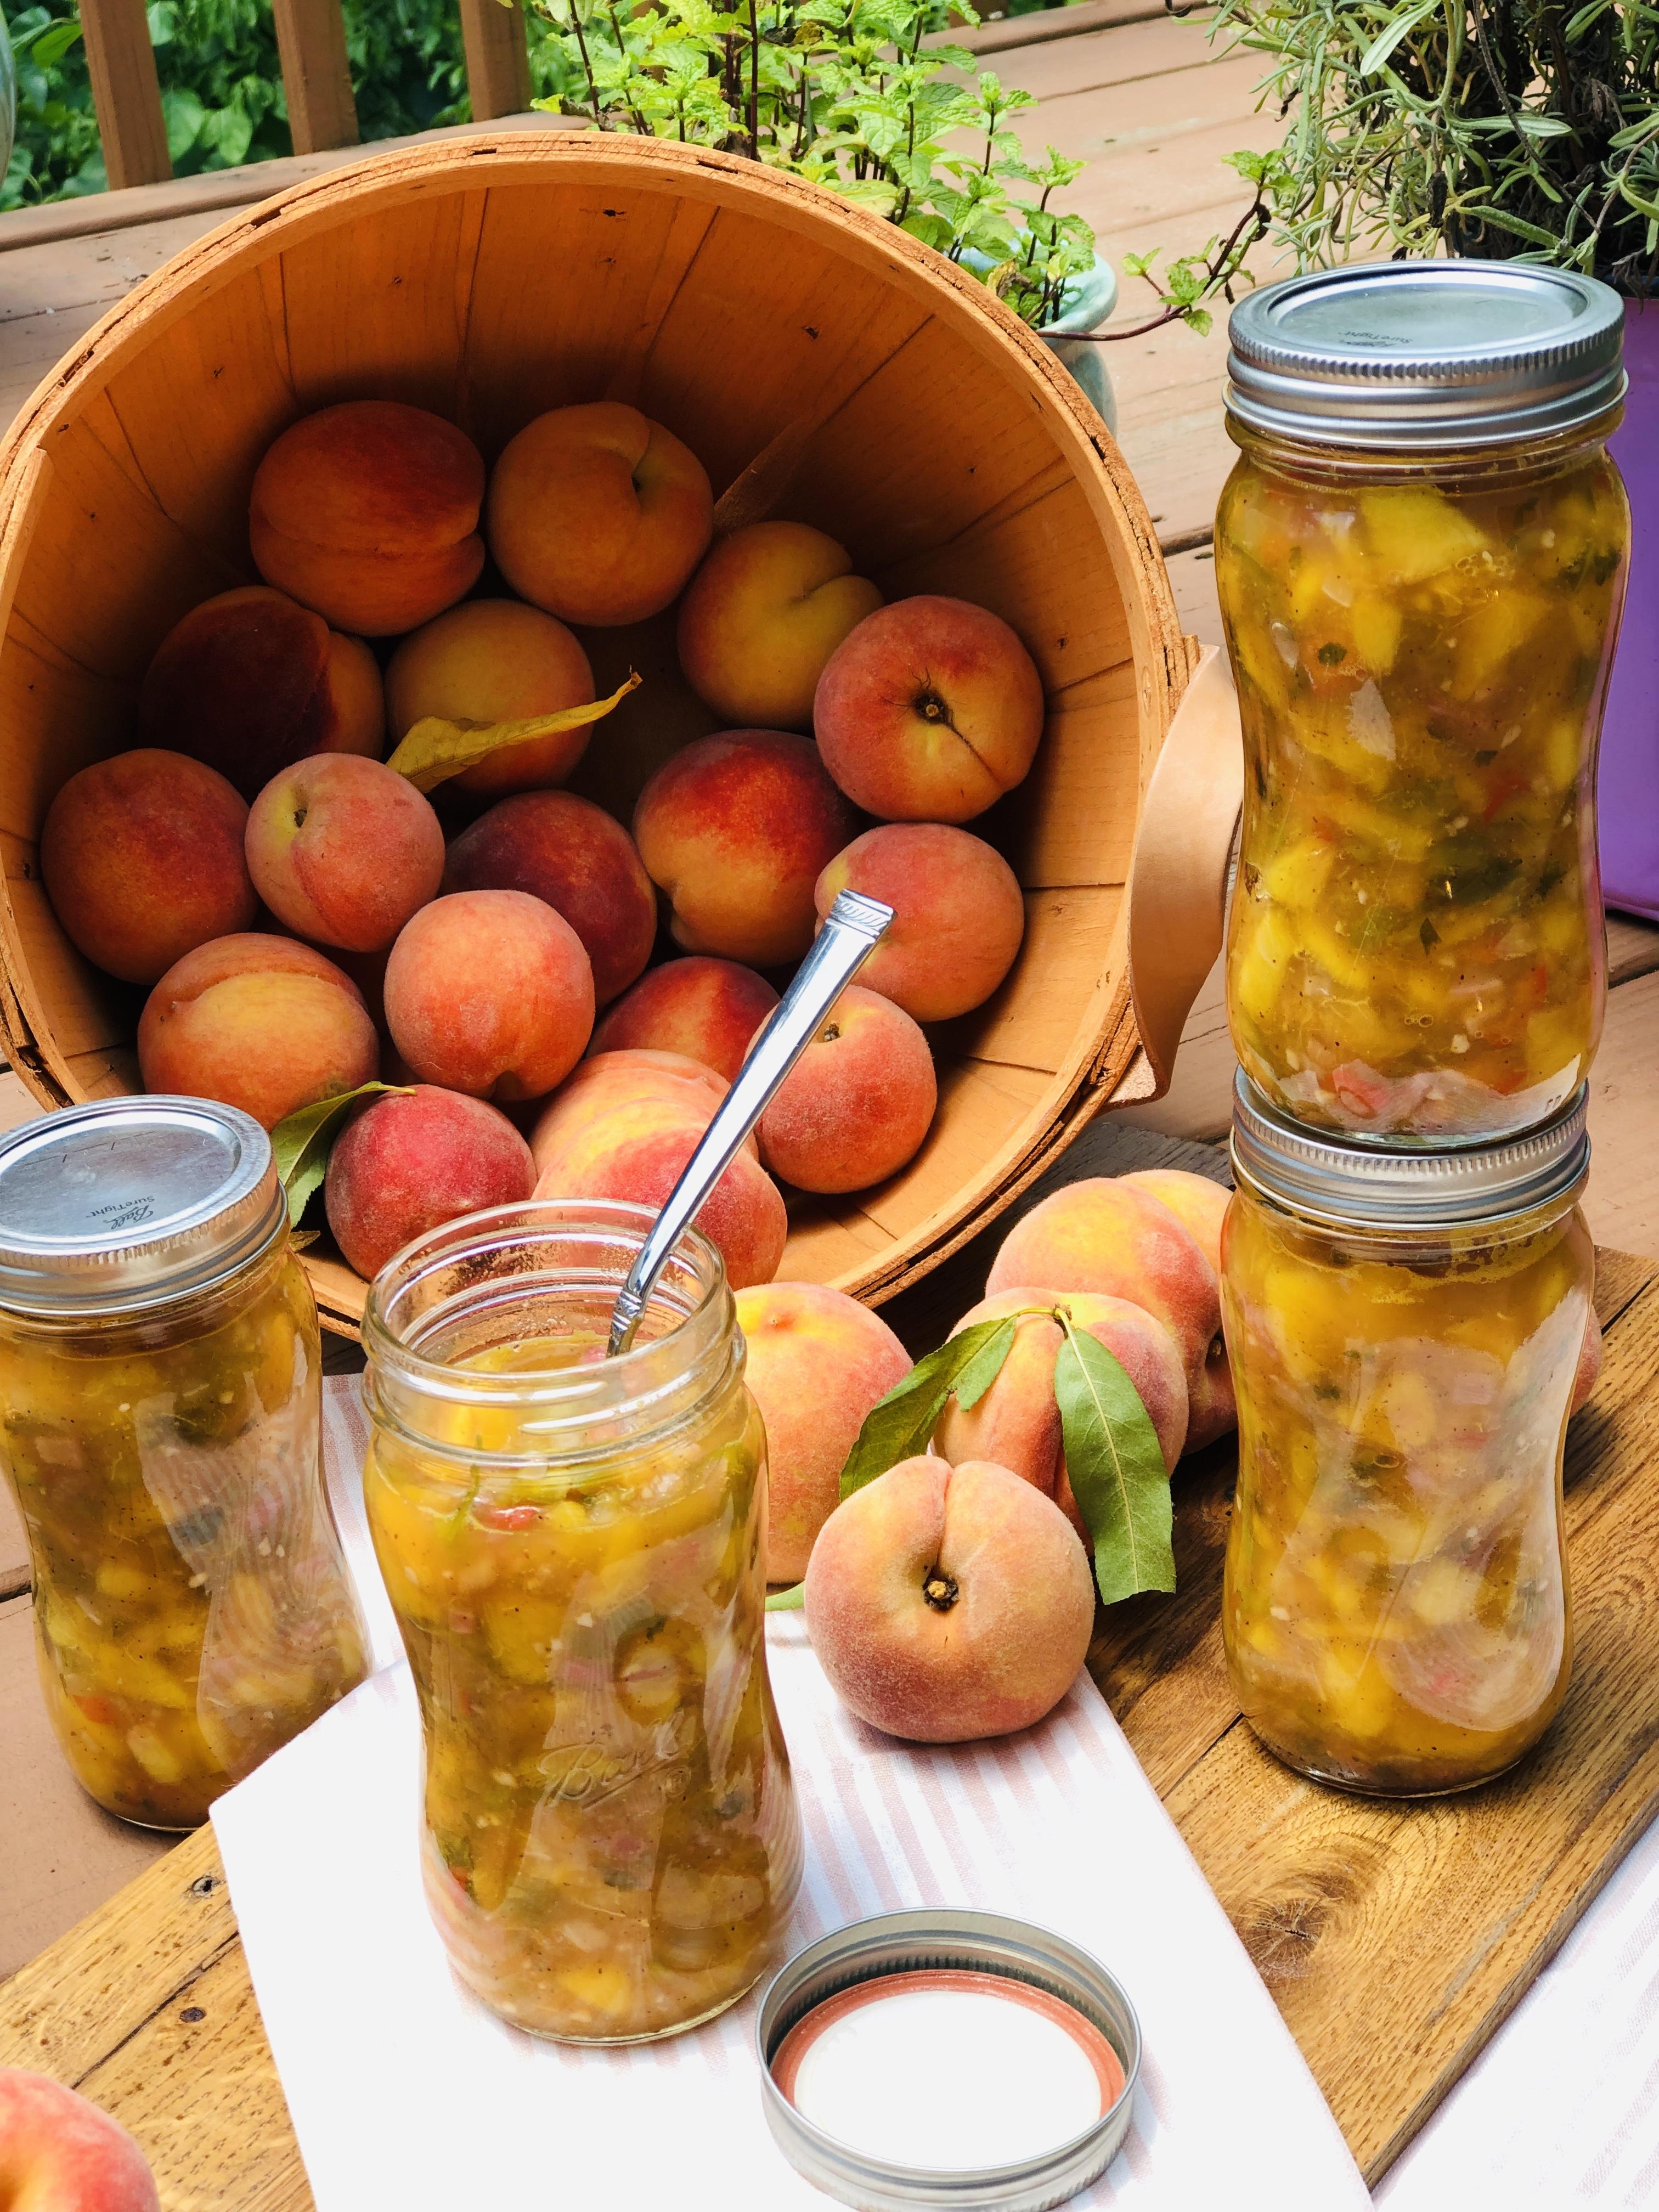 Girls Luncheon With Sweet Georgia Peaches & A Recipe!